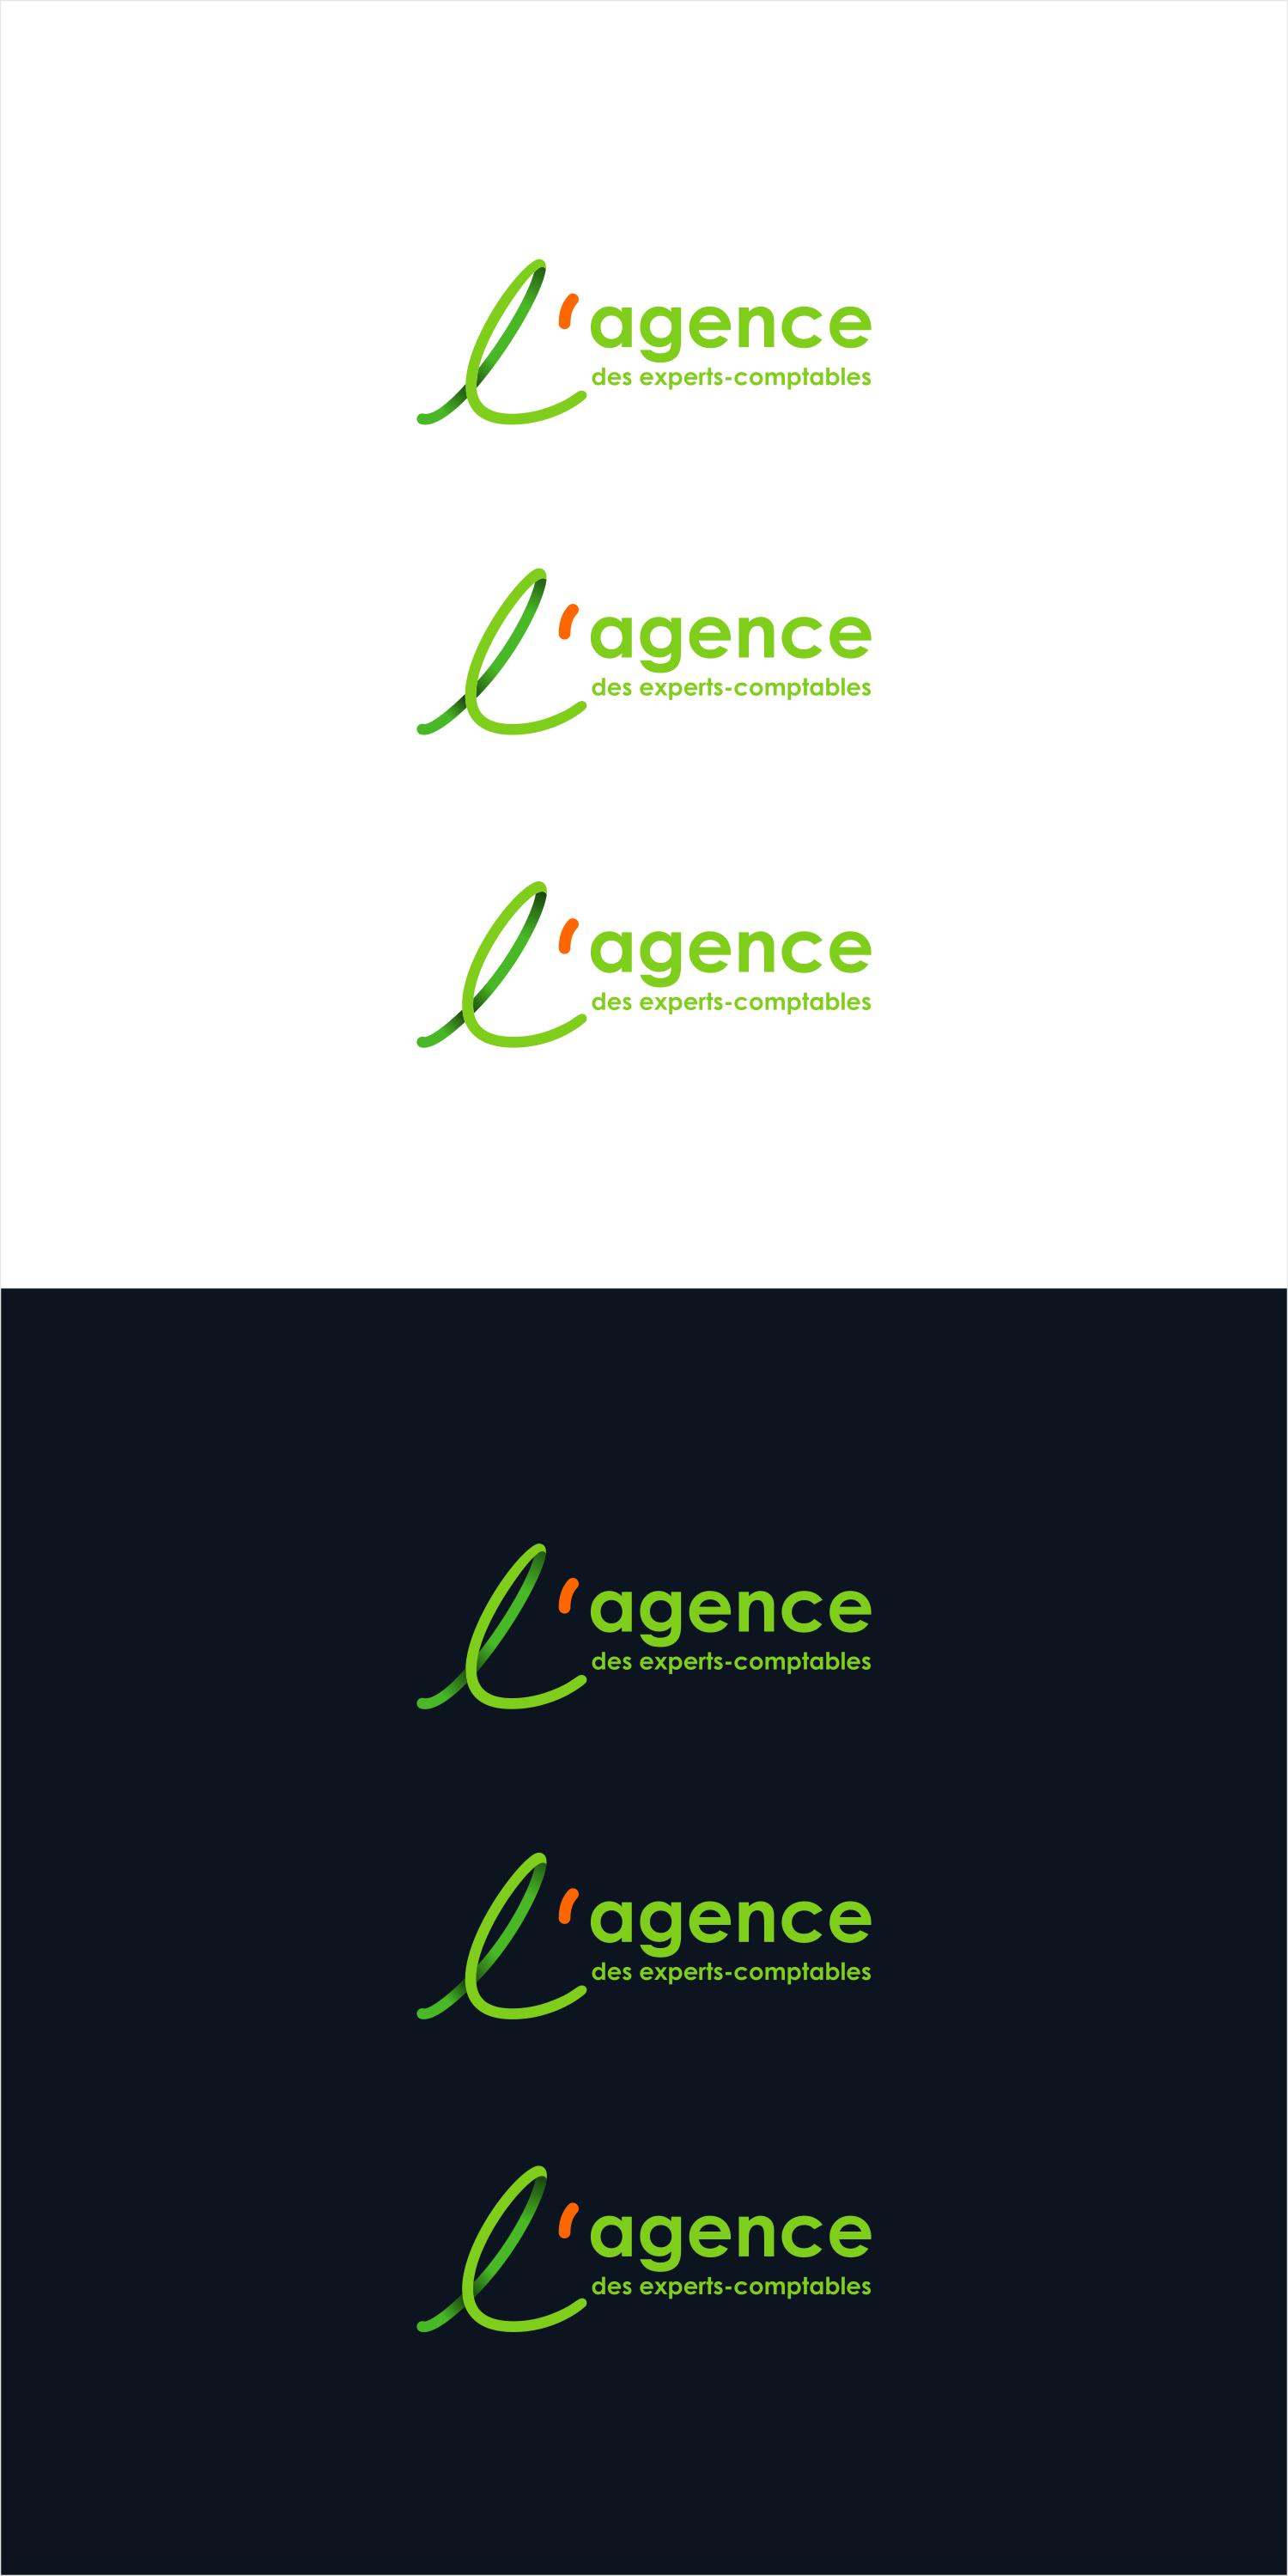 L'agence des experts-comptables